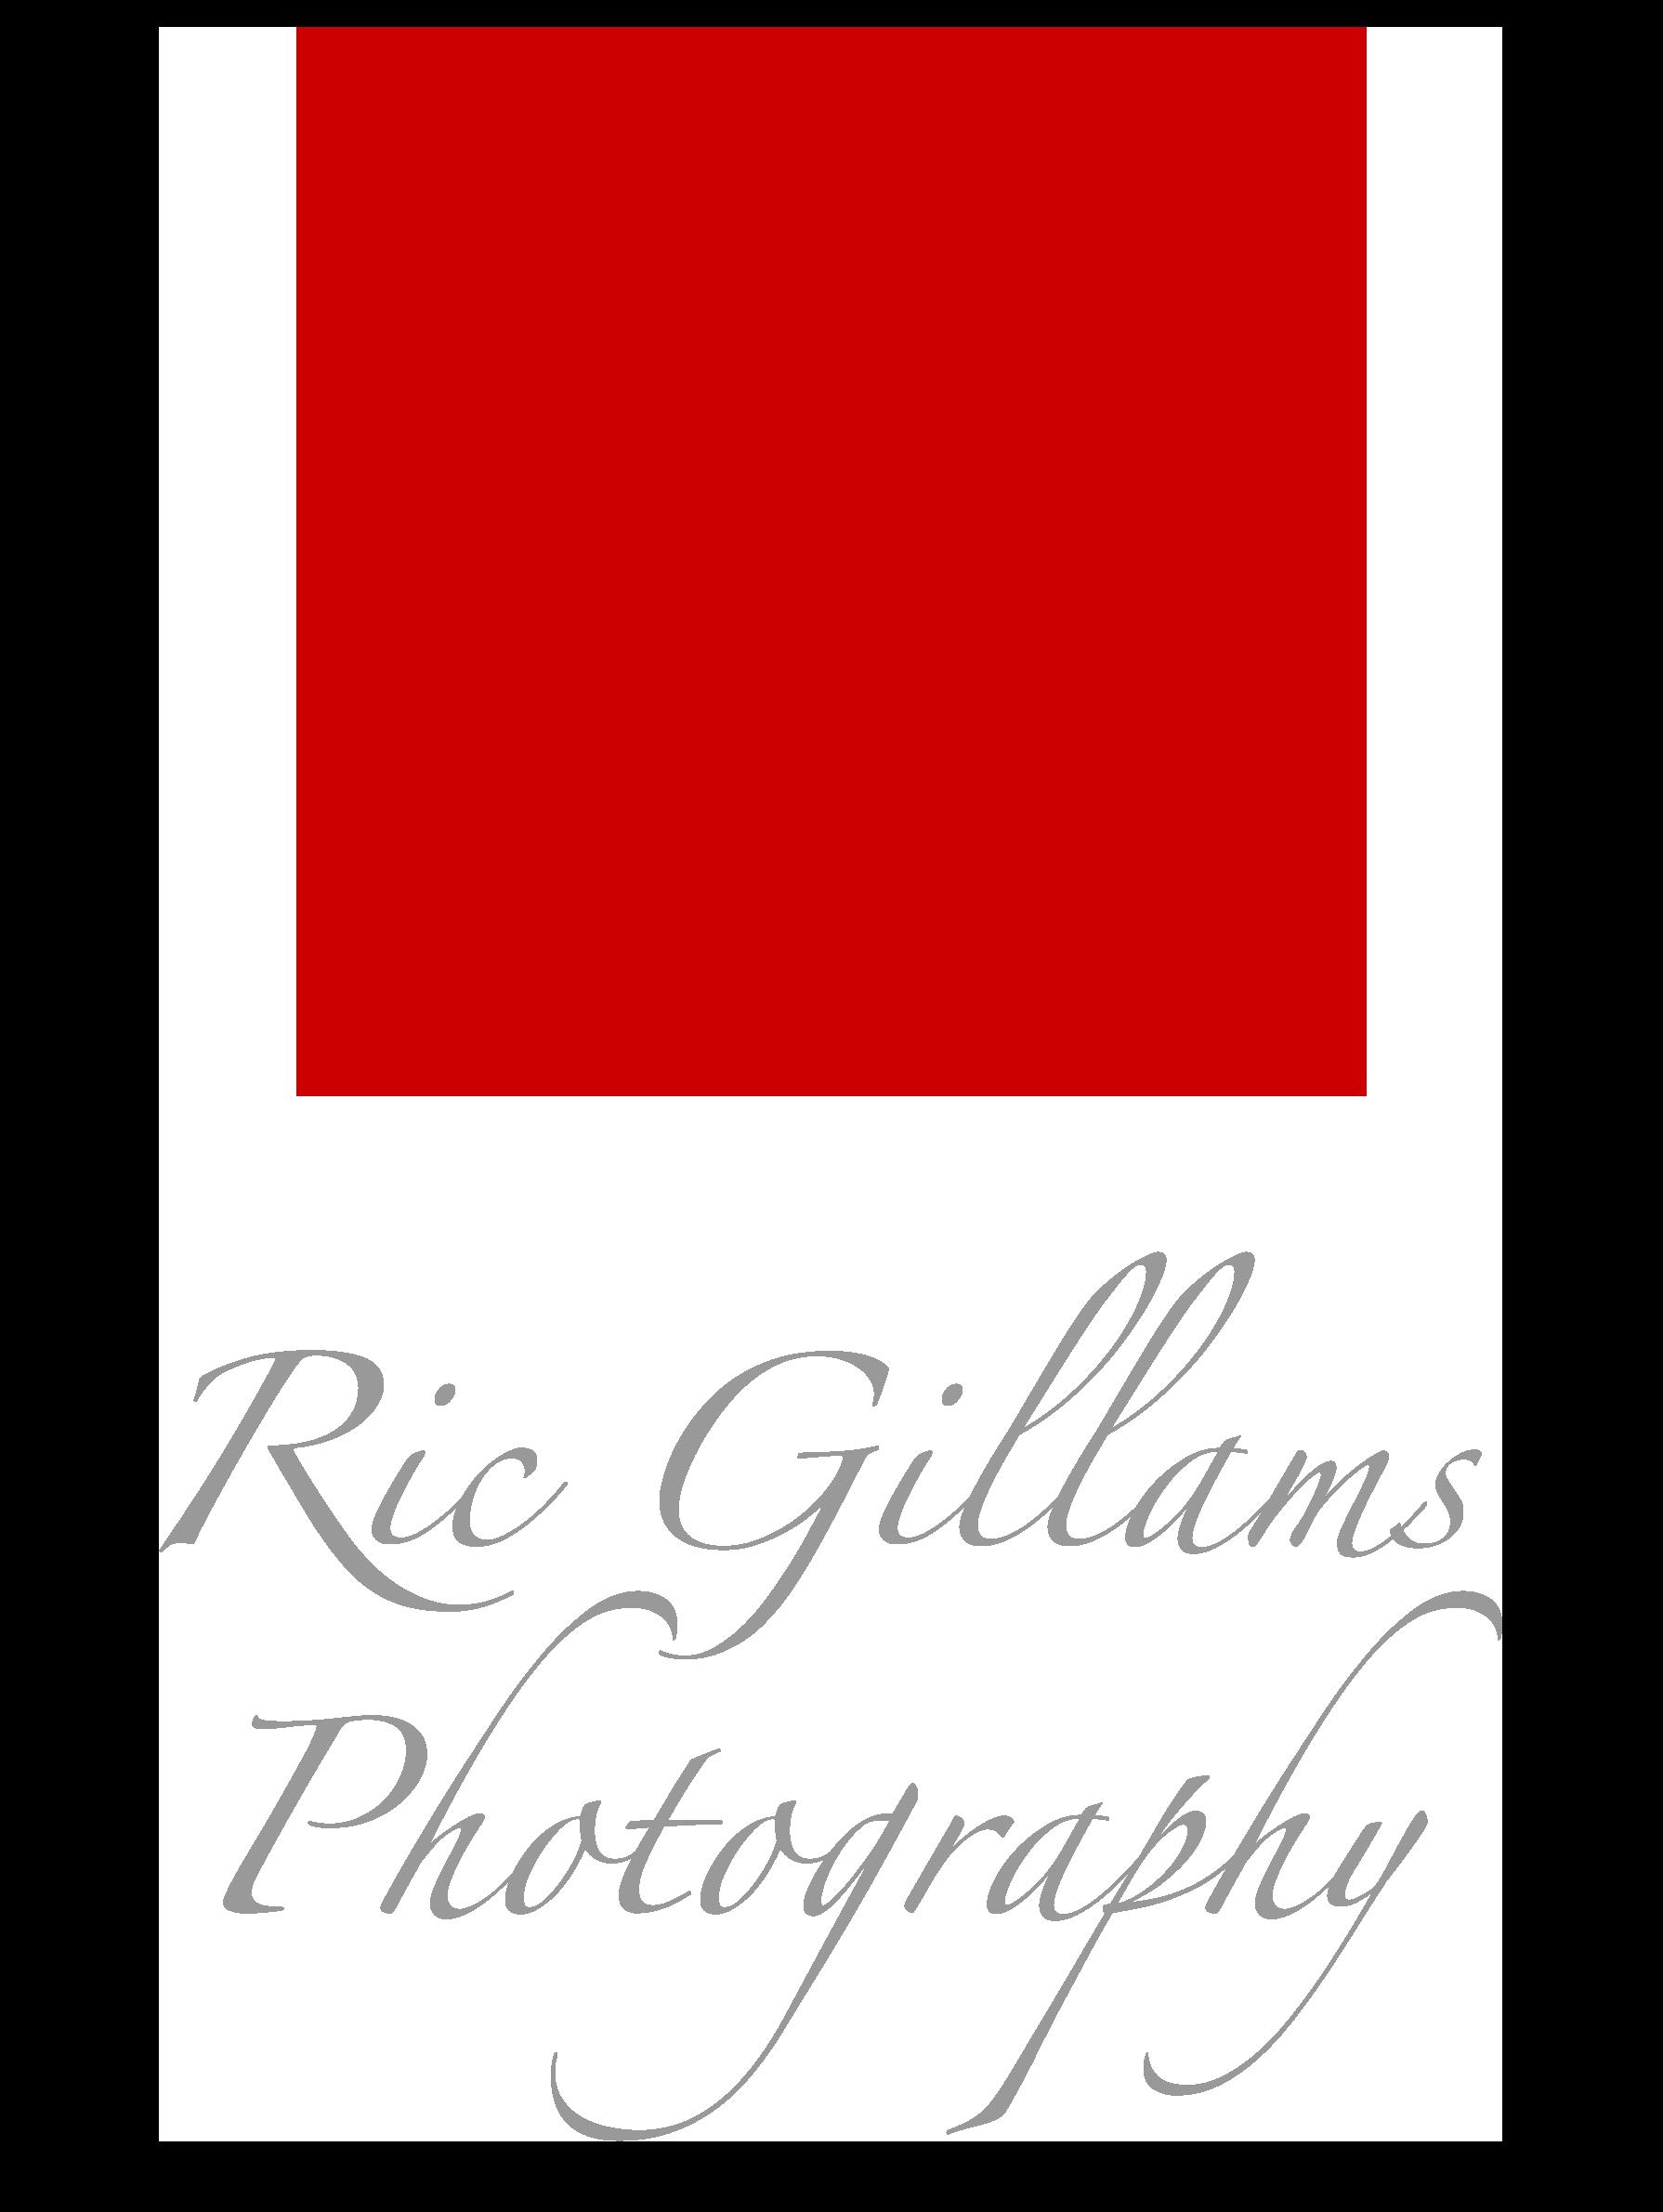 Richard Gillams Photography